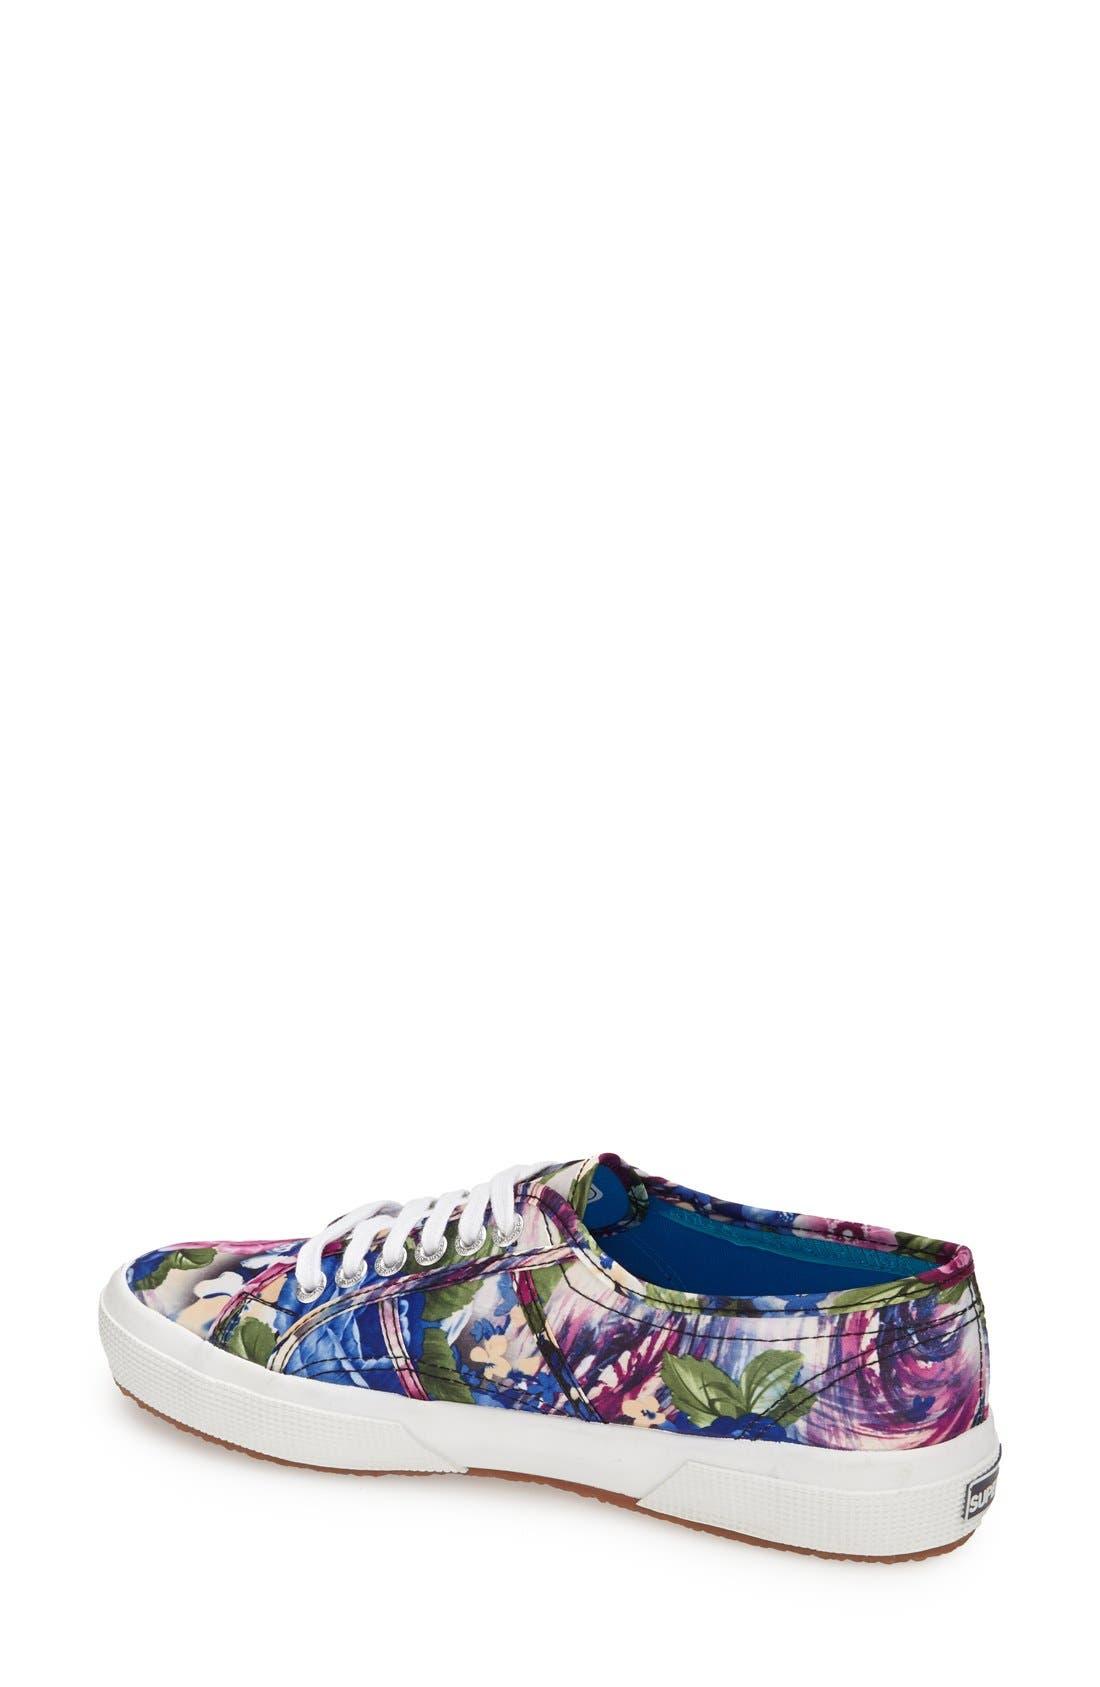 Alternate Image 2  - Superga 'Cotu' Floral Print Sneaker (Women)